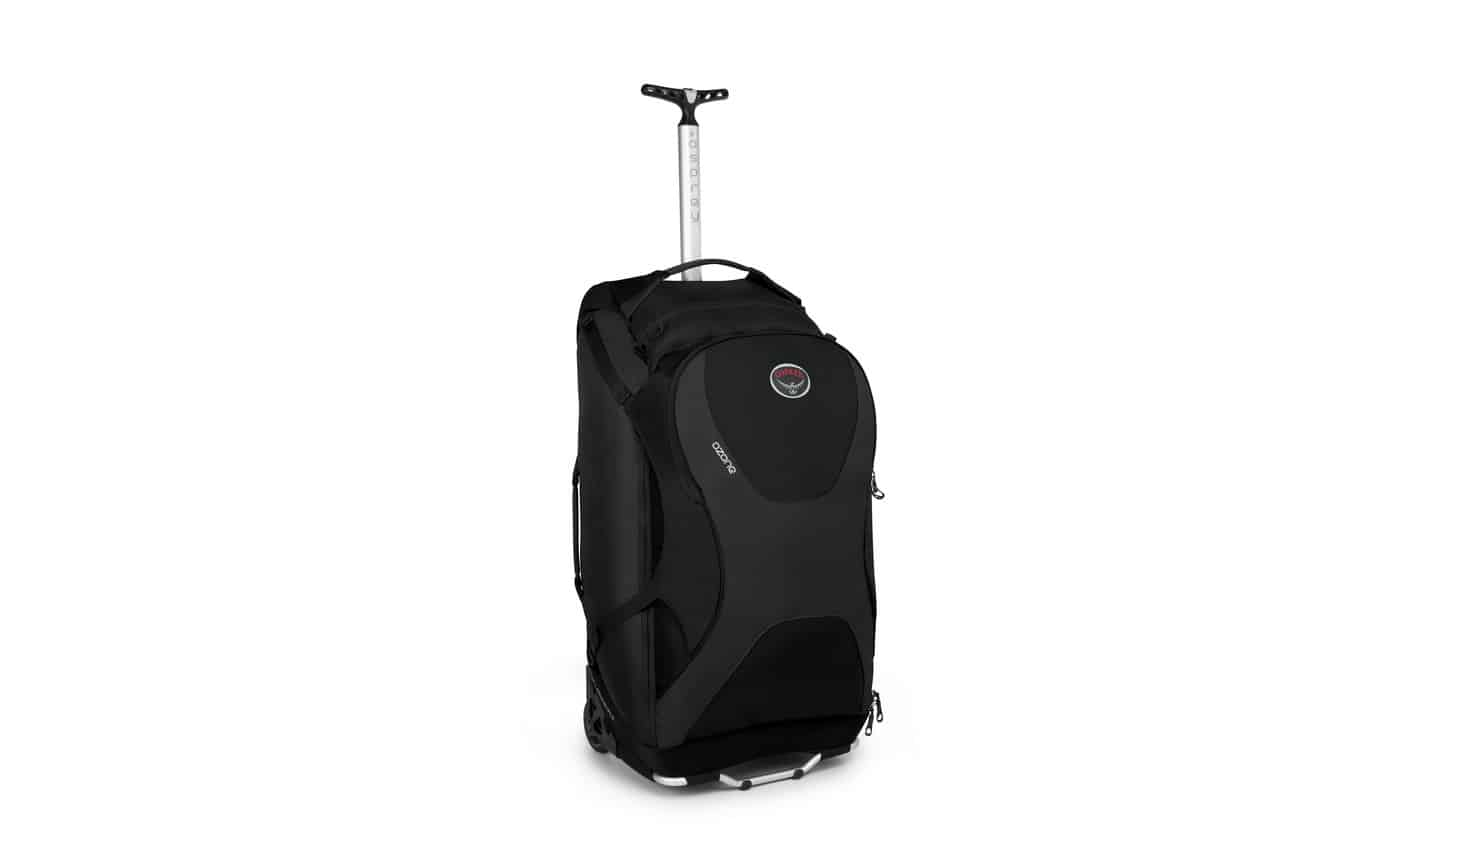 Osprey_Ozone_80_Rolling_Case_Black[1470x849]